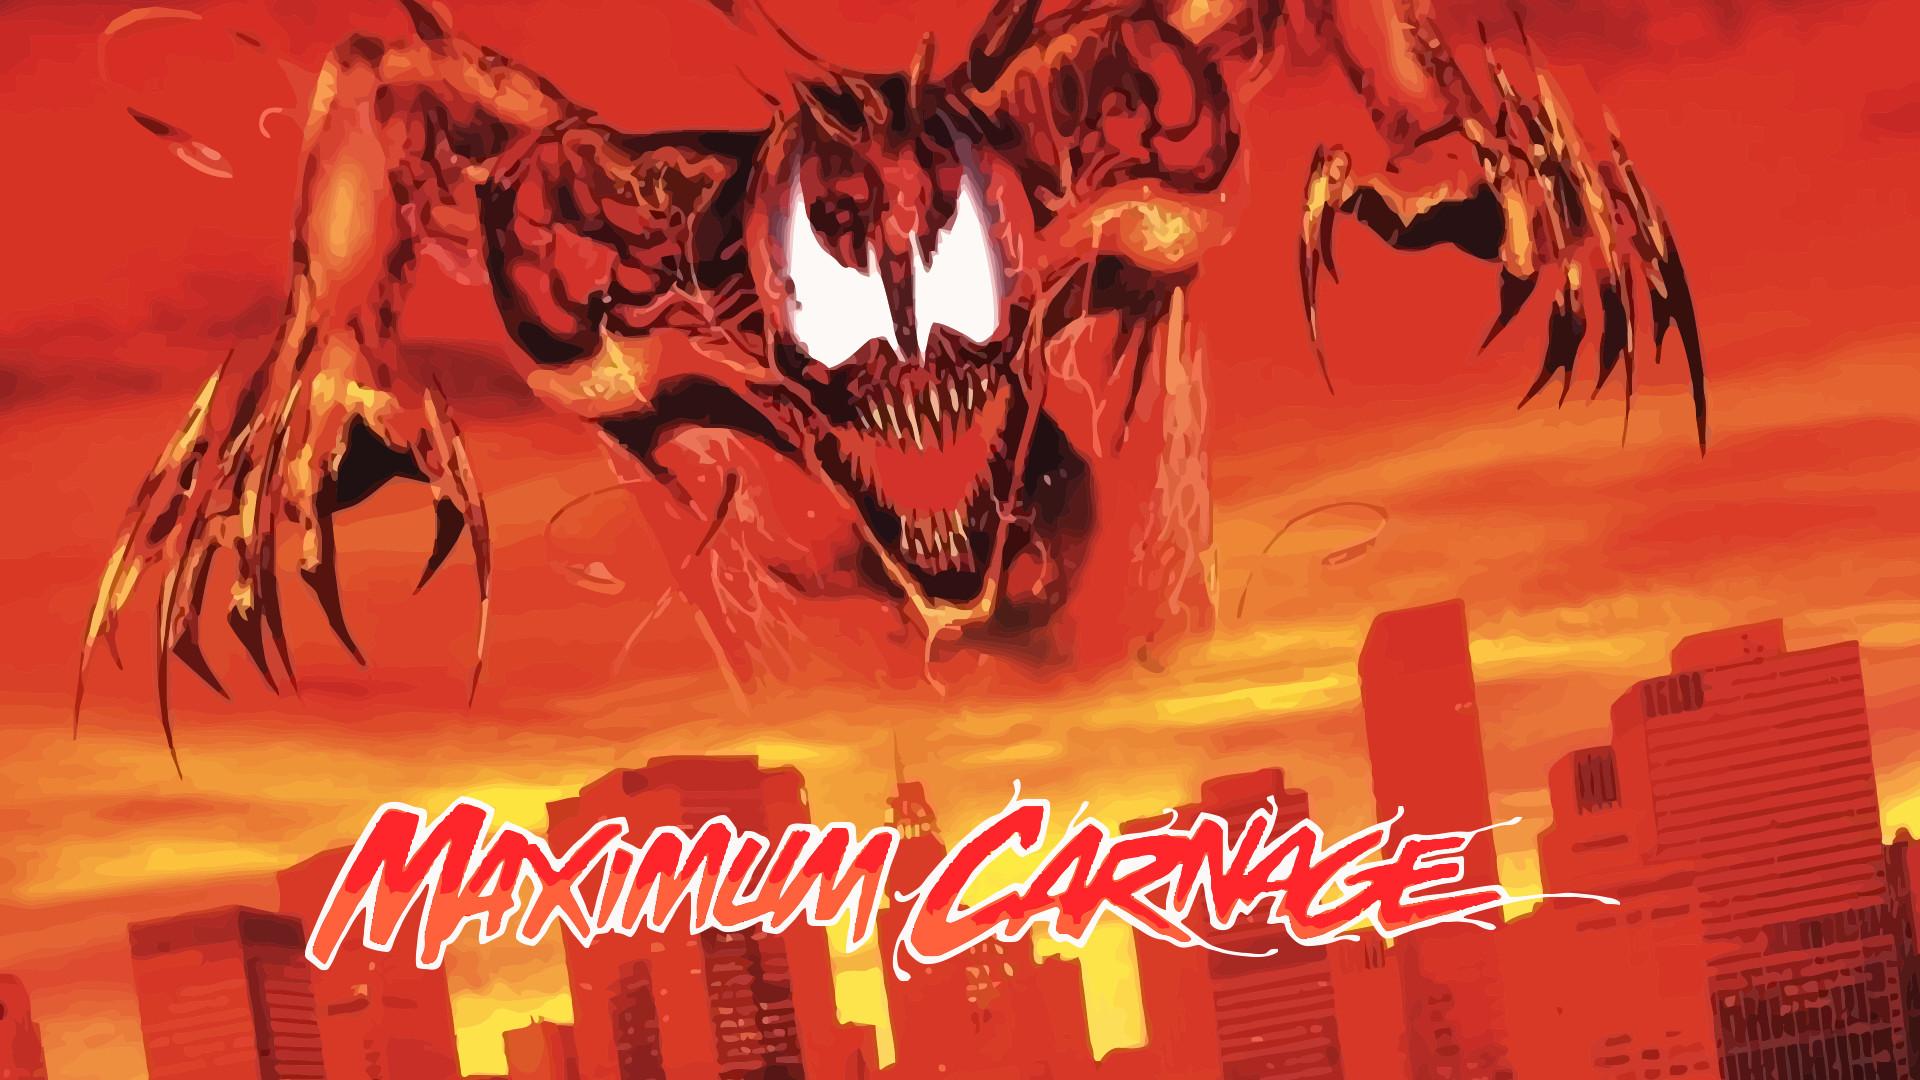 Maximum Carnage Wallpaper Maximum Carnage Official Poster Update by  ProfessorAdagio on .